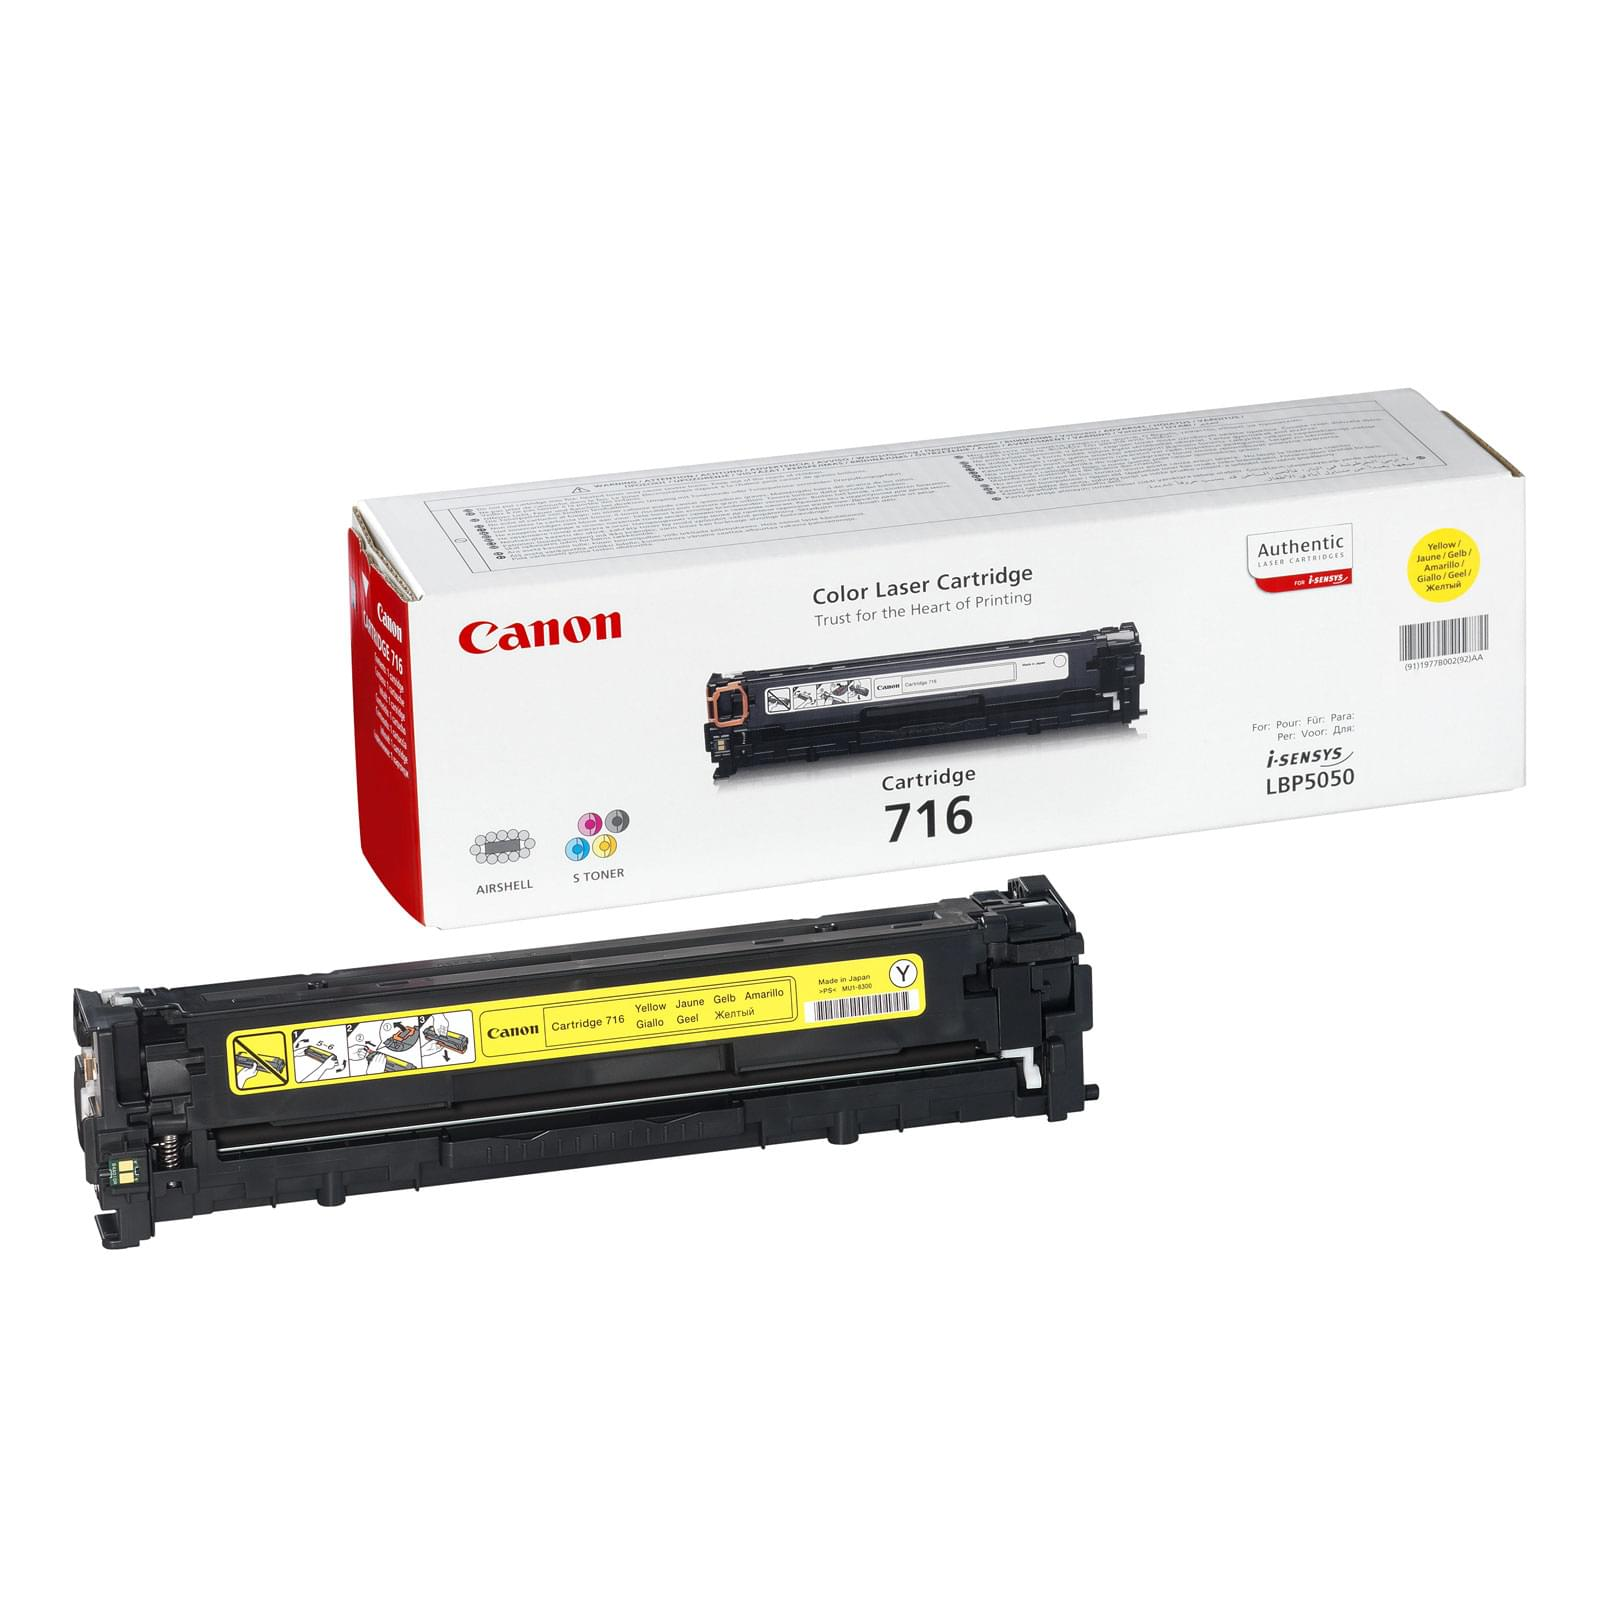 Toner CRG 716 Jaune - 1977B002 pour imprimante Laser Canon - 0